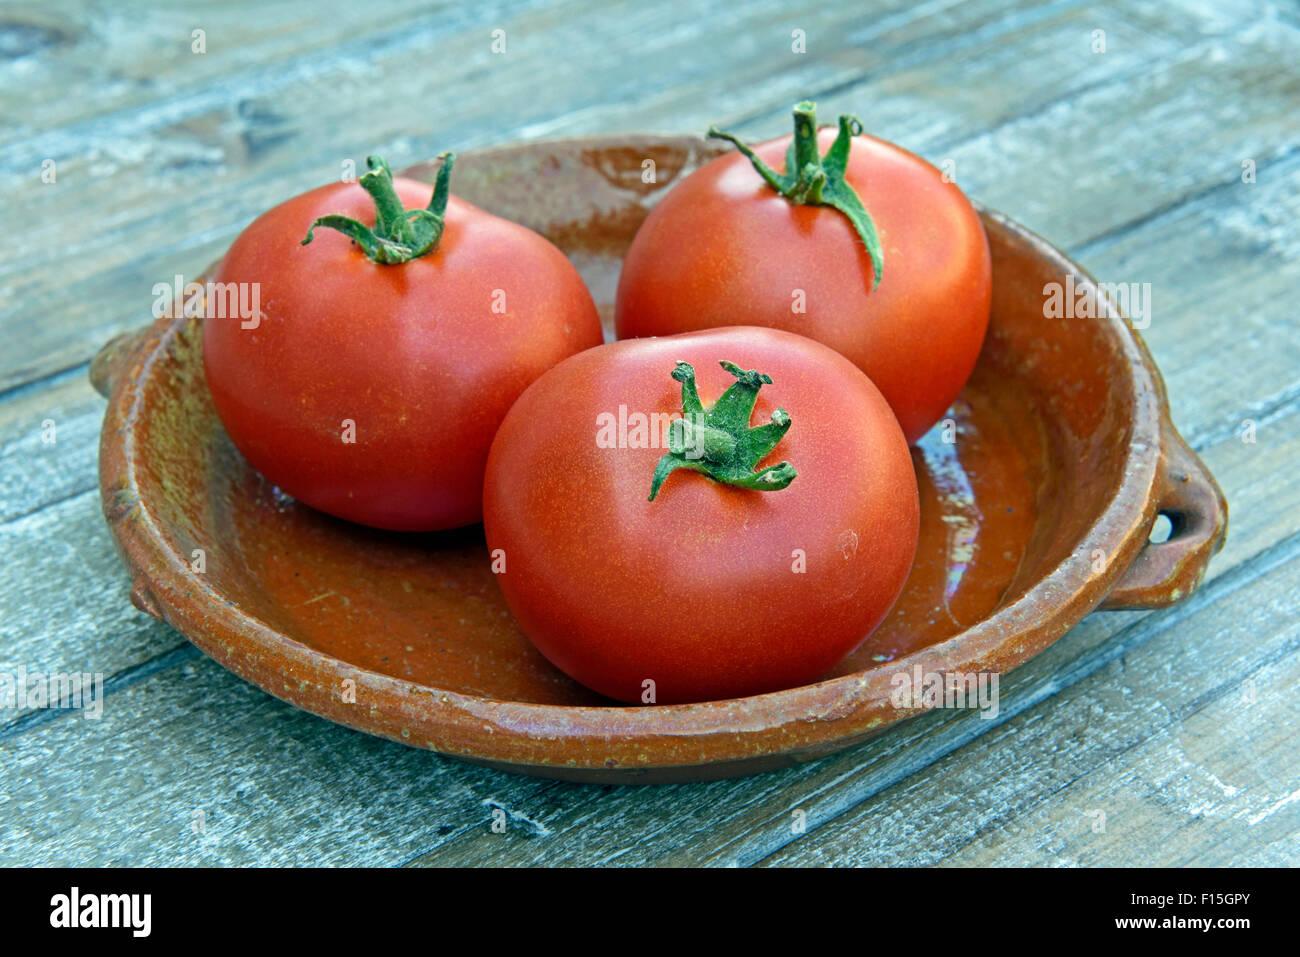 Essex Wonder tomatoes, 3 displayed on vintage terracotta dish - Stock Image